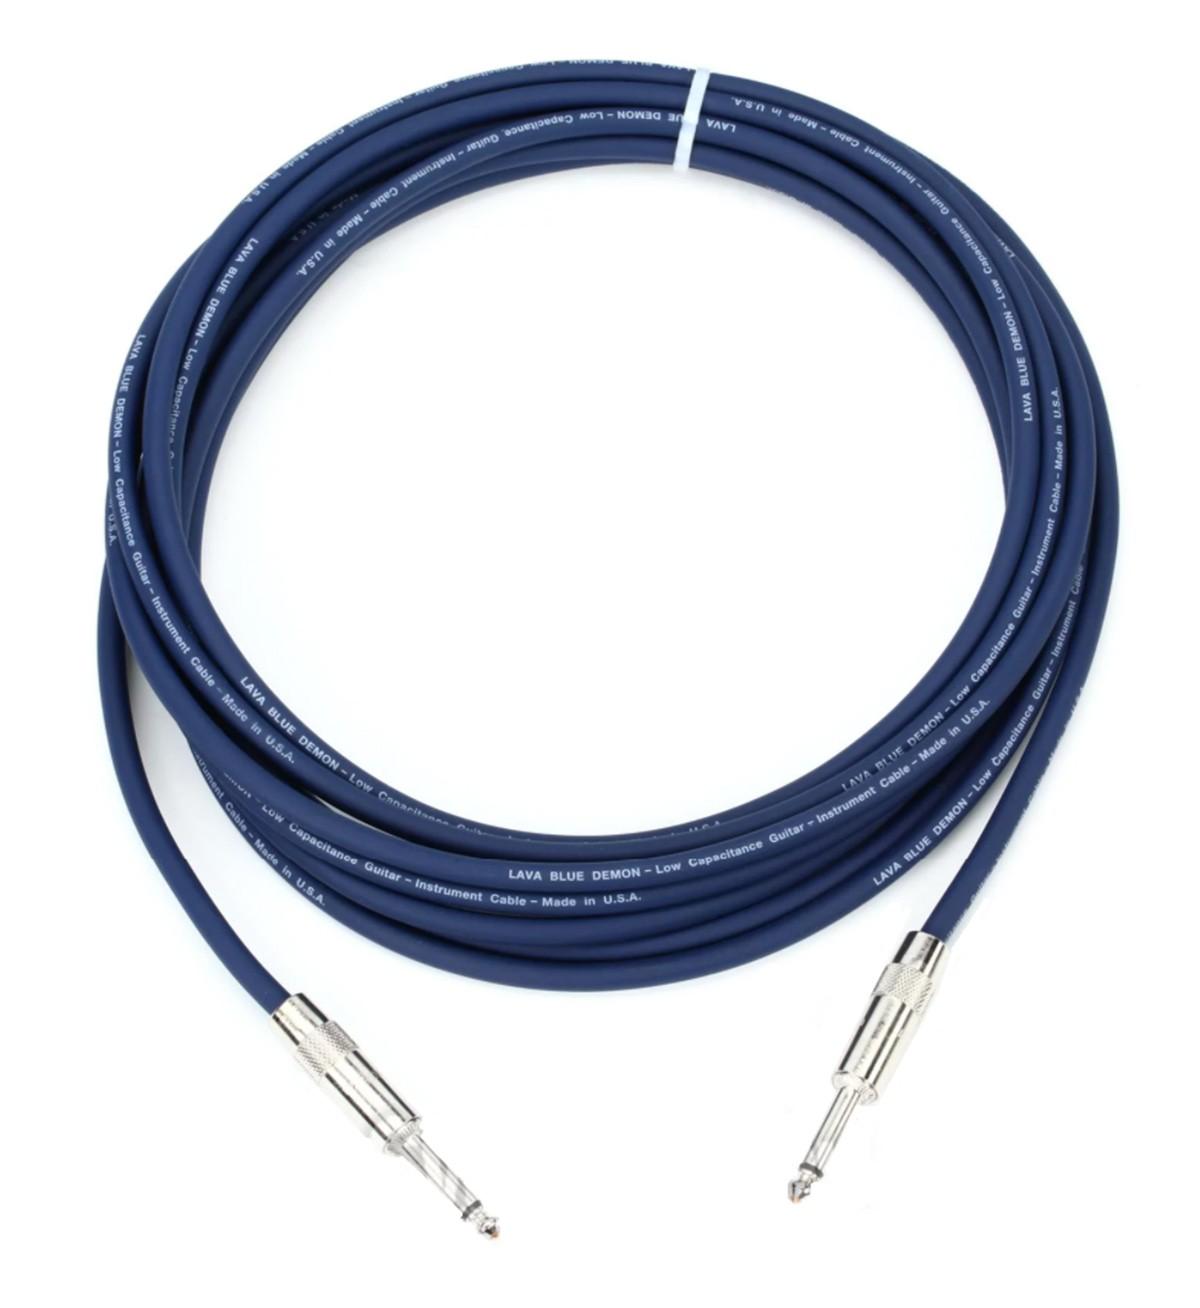 CABO P/INSTRUMENTOS P10 MONO (TS) 6M LAVA CABLE BLUE DEMON LCBD20